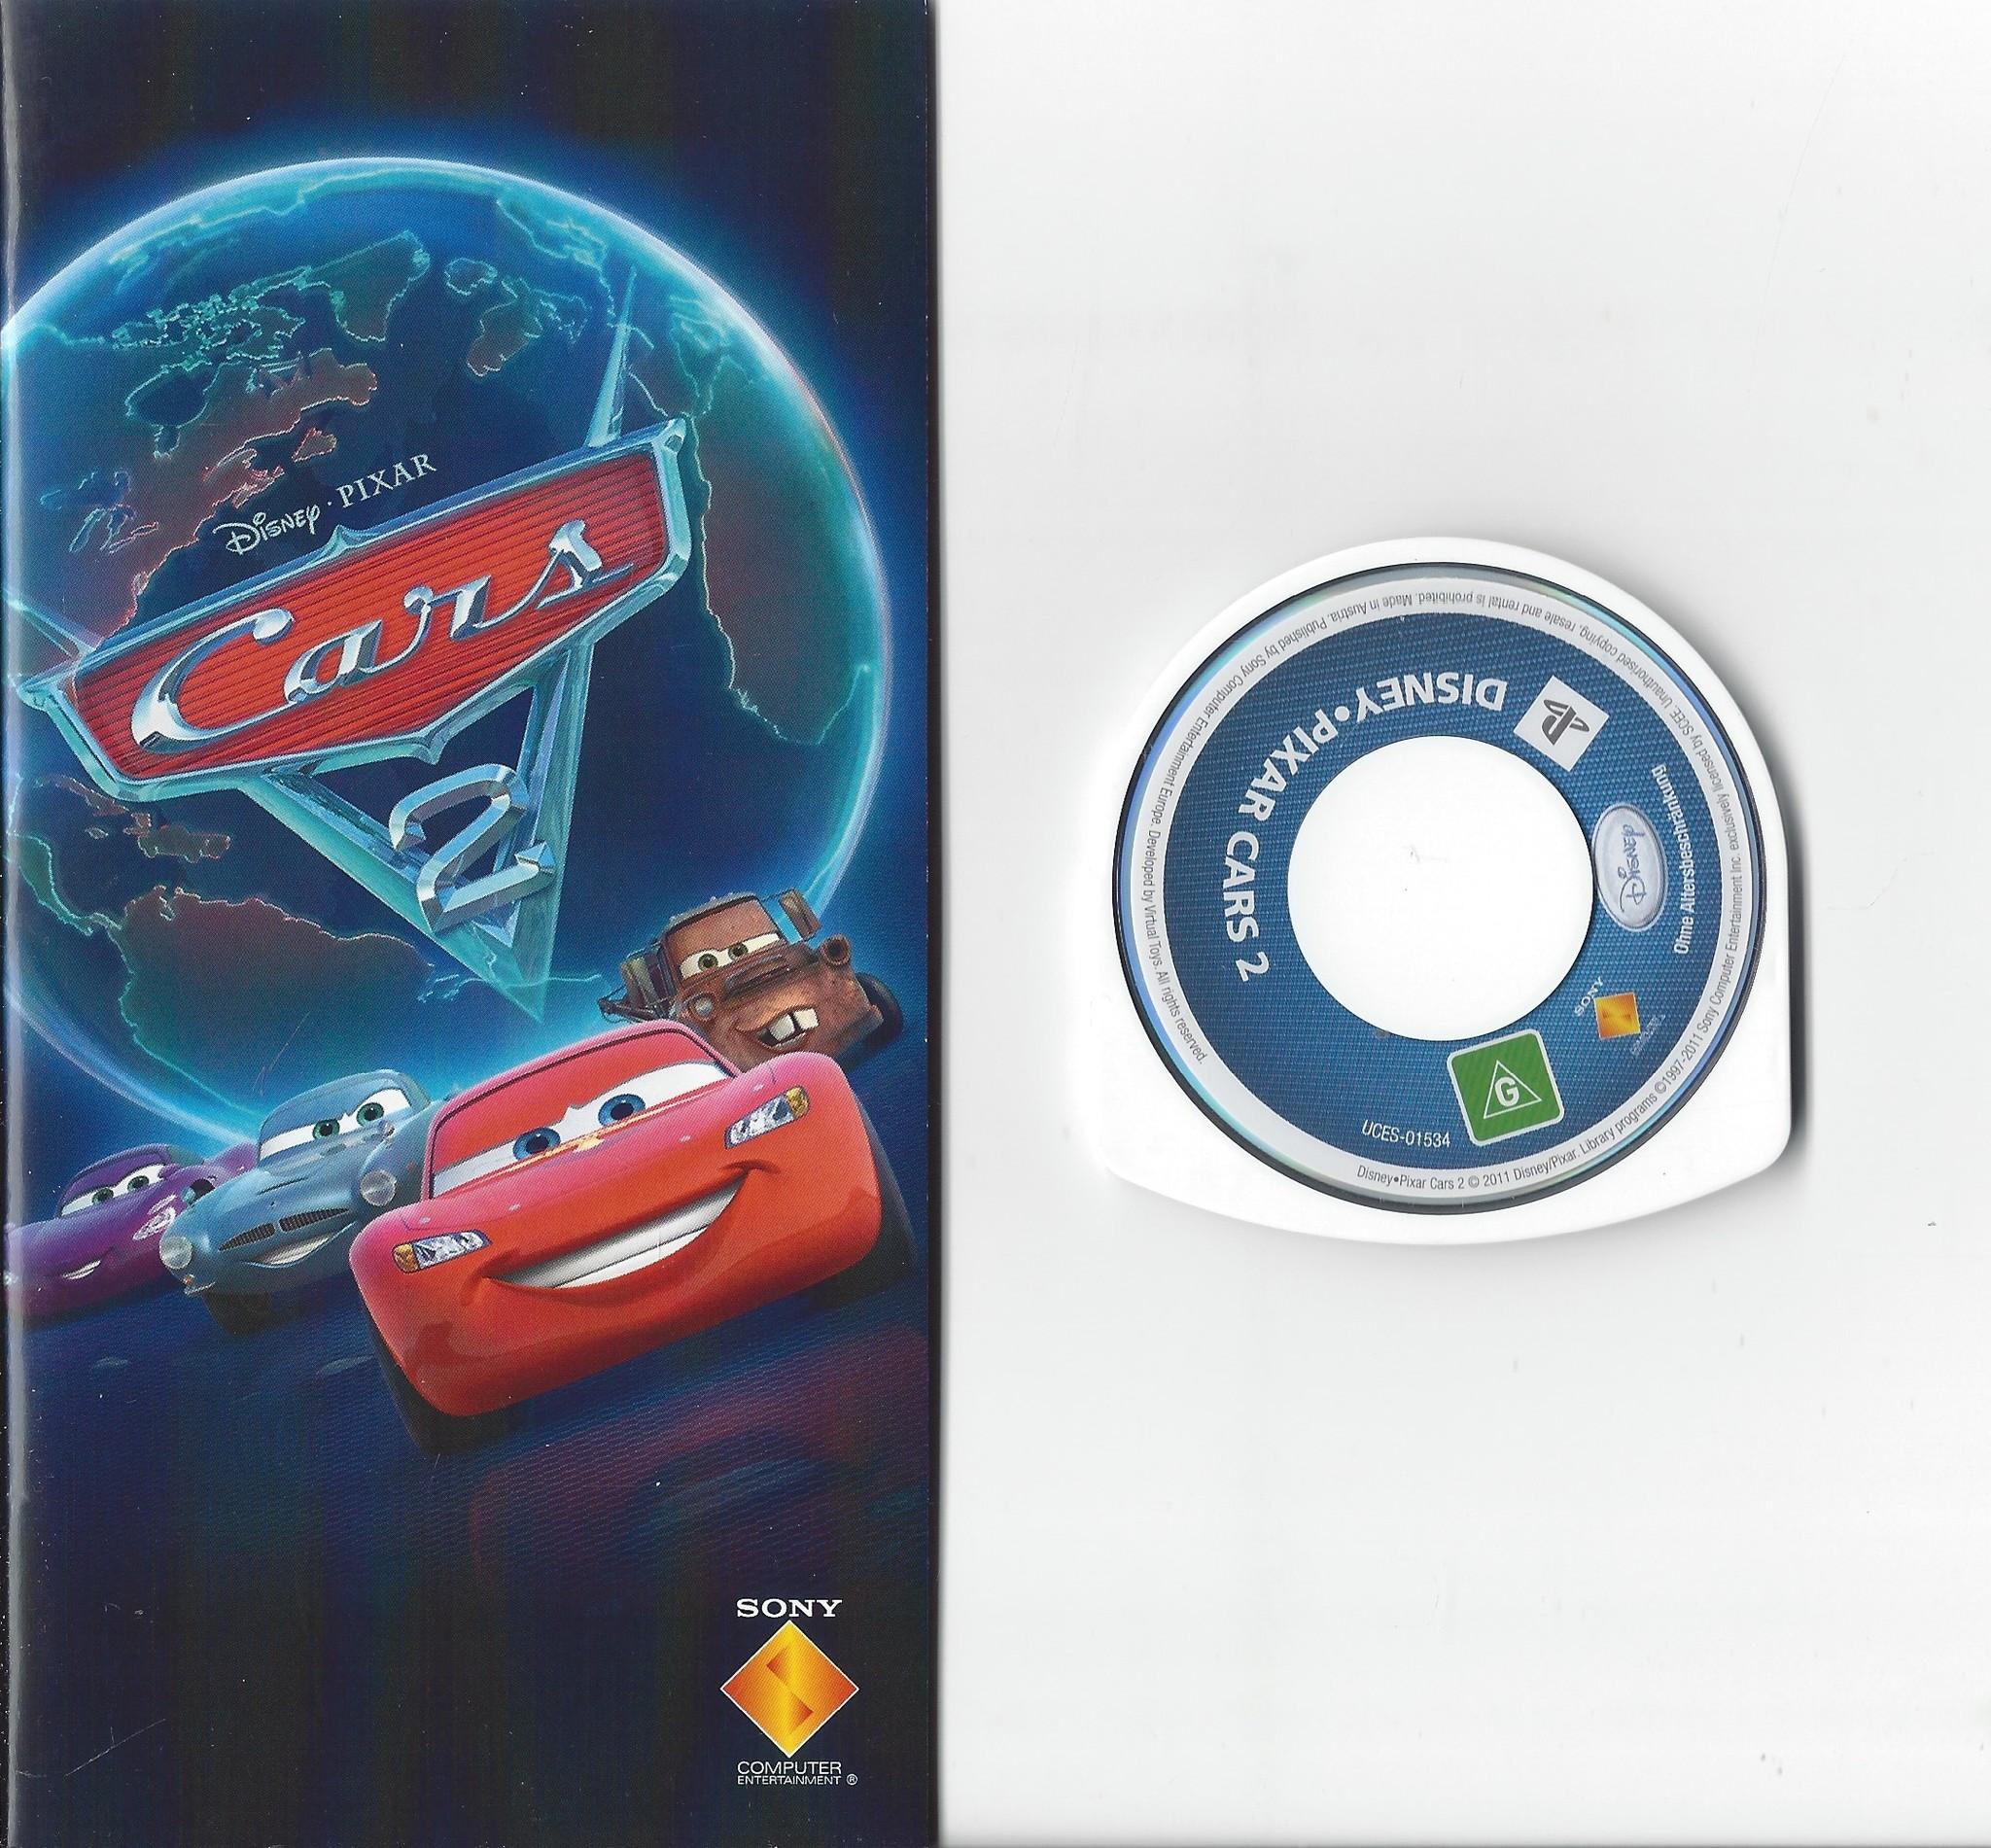 Disney Pixar Cars 2 For Playstation Portable Psp Passion For Games Webshop Passion For Games